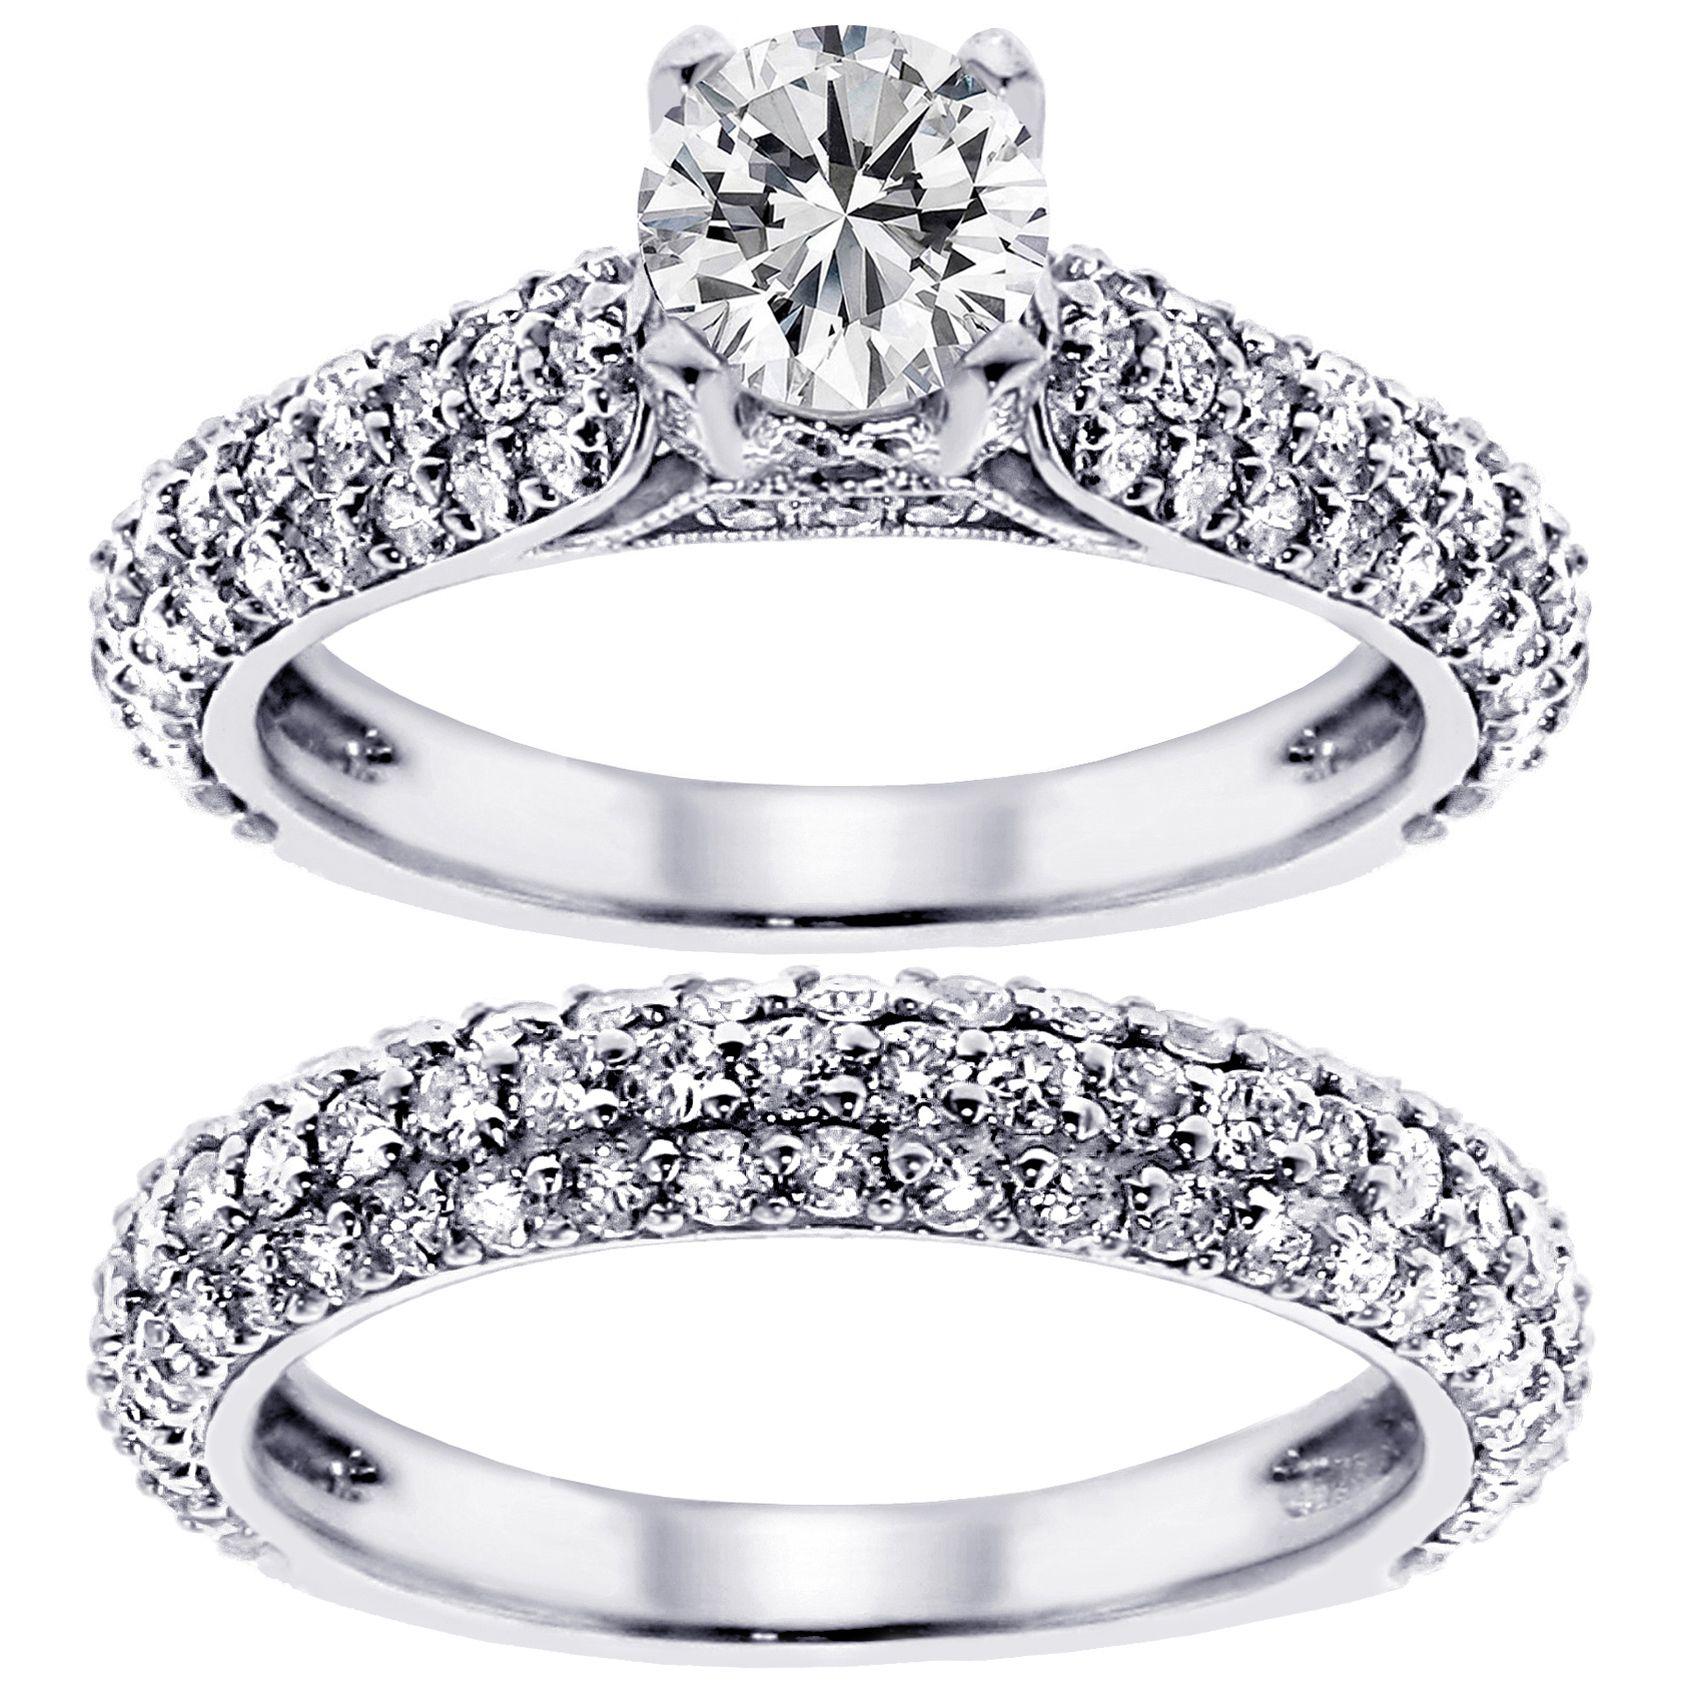 14k/ 18k Gold or Platinum 3 1/2ct TDW Diamond Bridal Ring